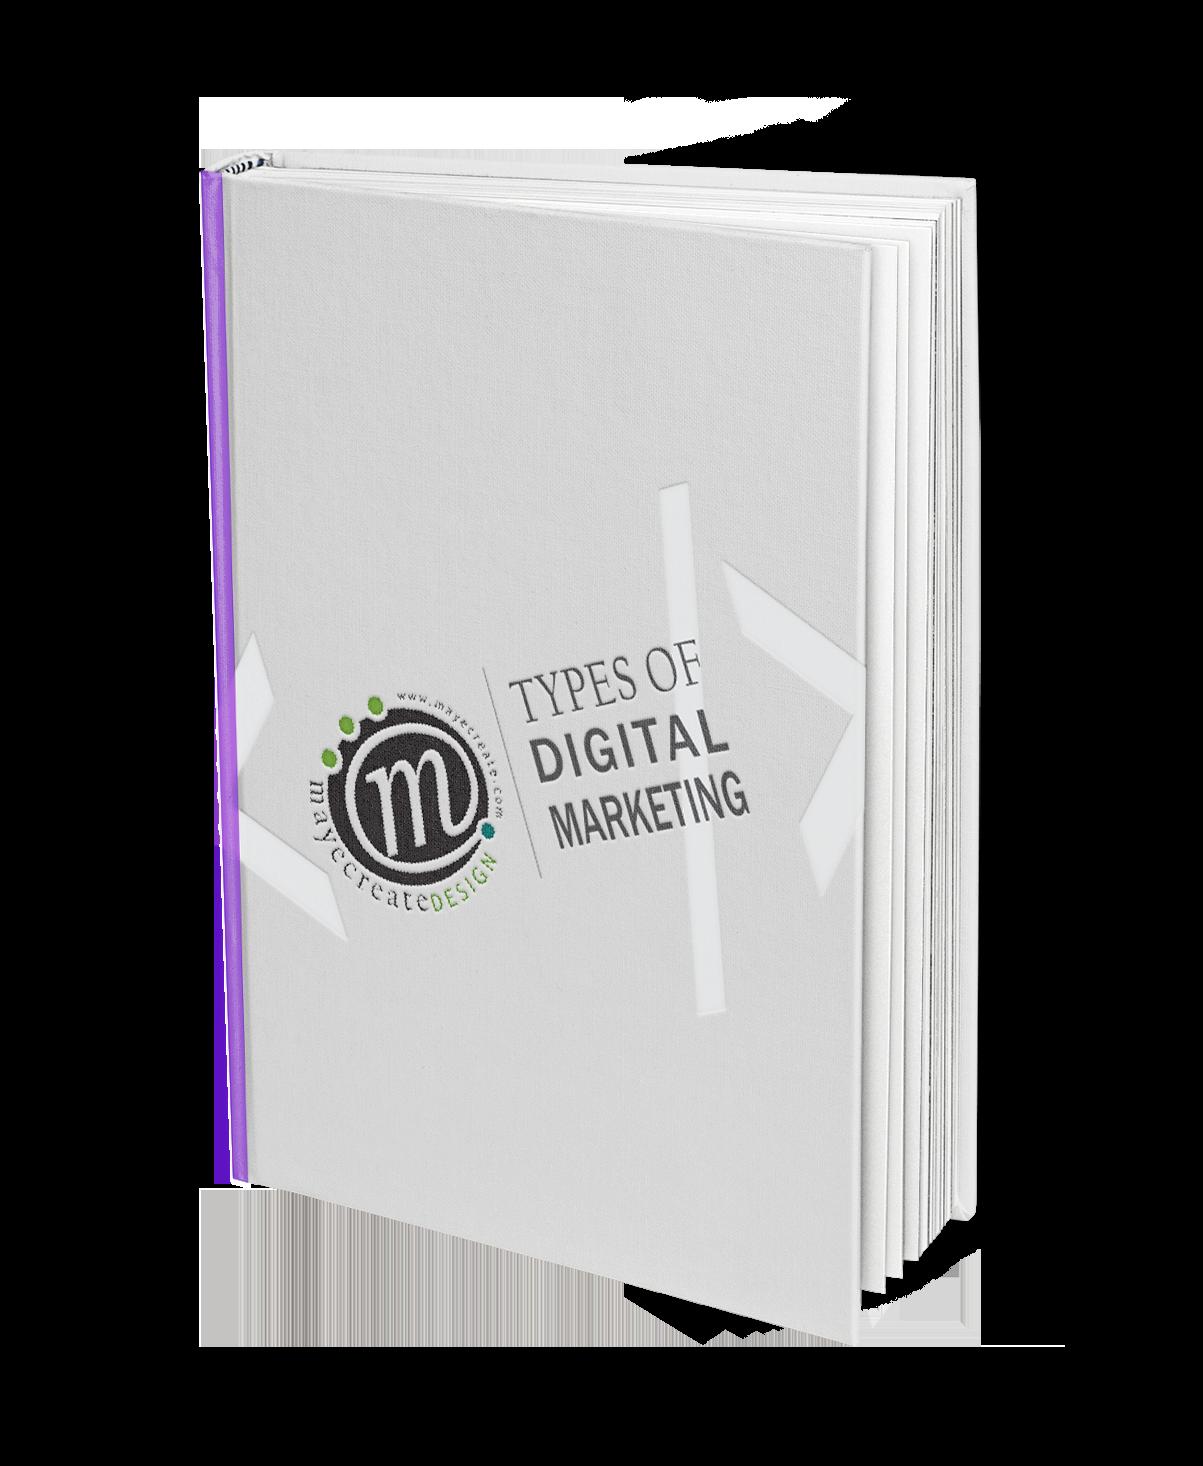 Types of Digital Marketing E-Book